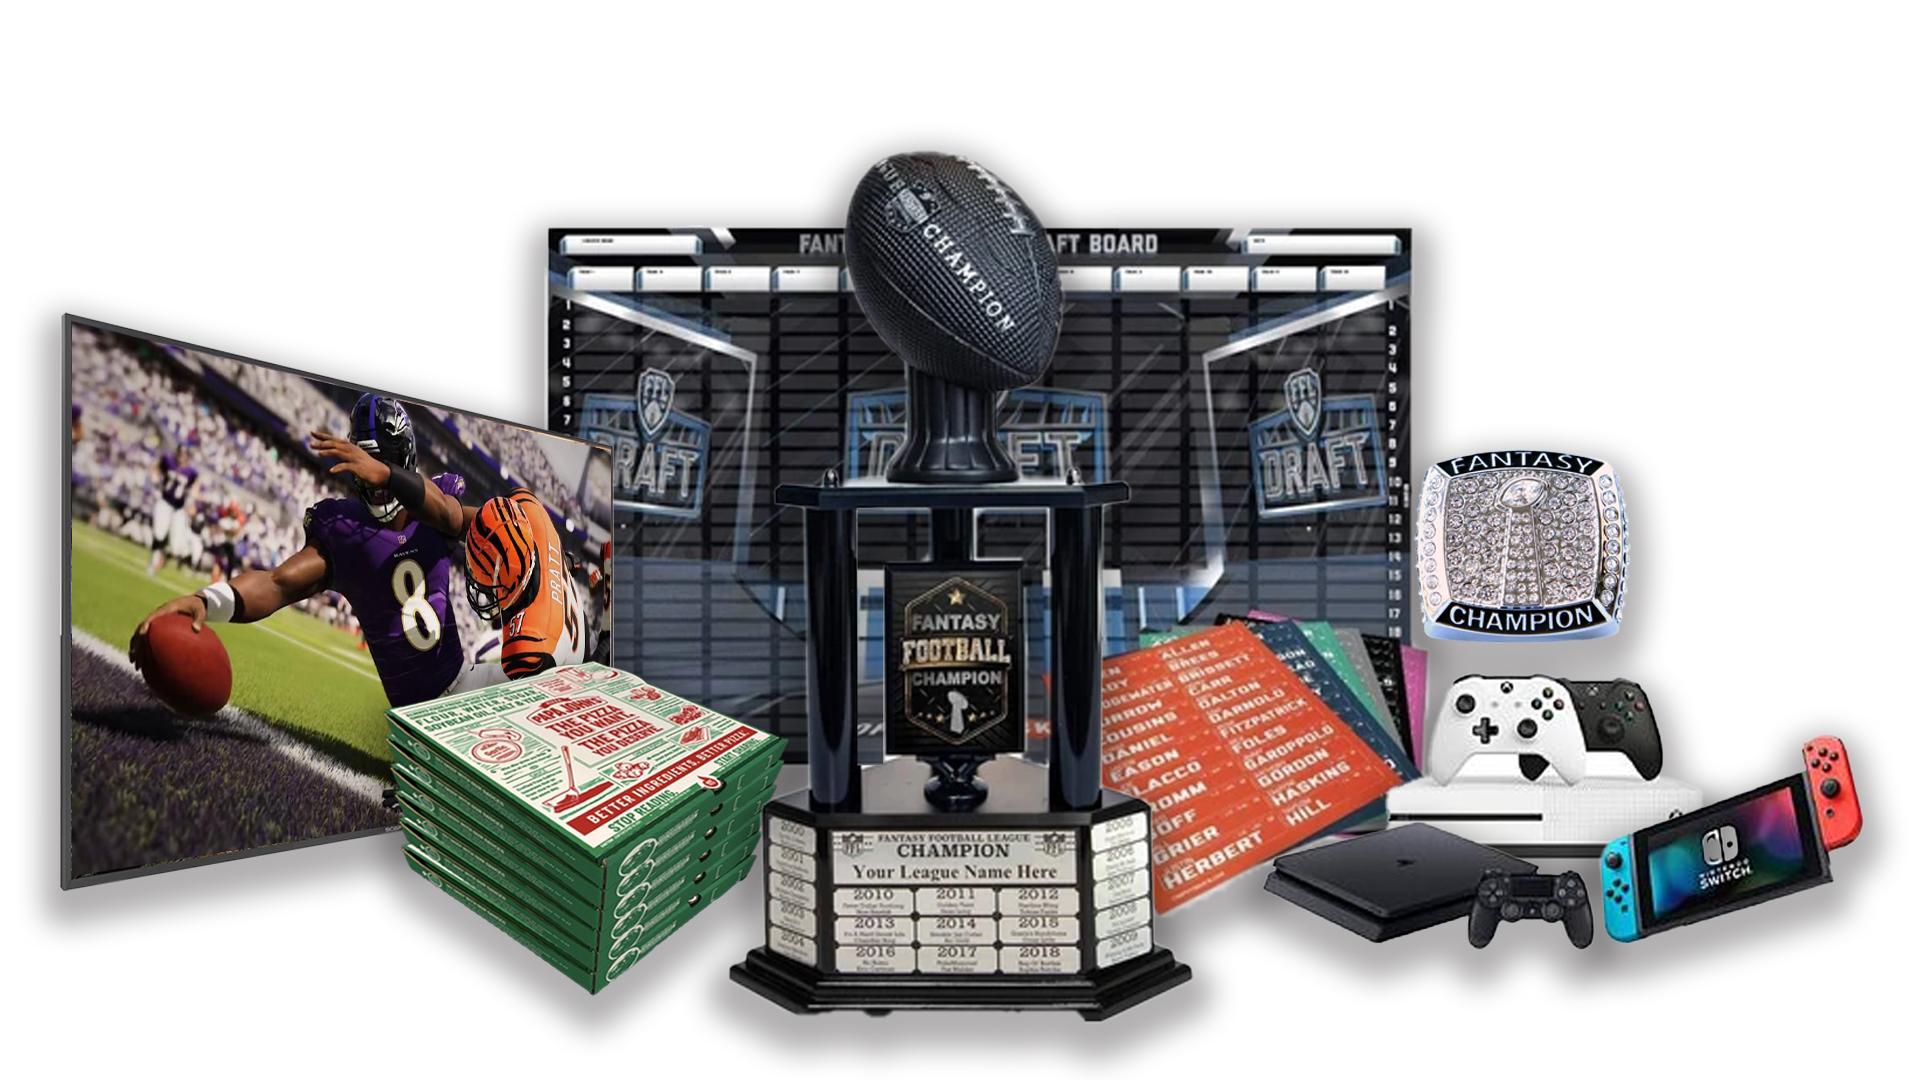 - FFDraft Trophy 3 Black Pizza - Fantasy Football Draft Parties at 1Life2Play